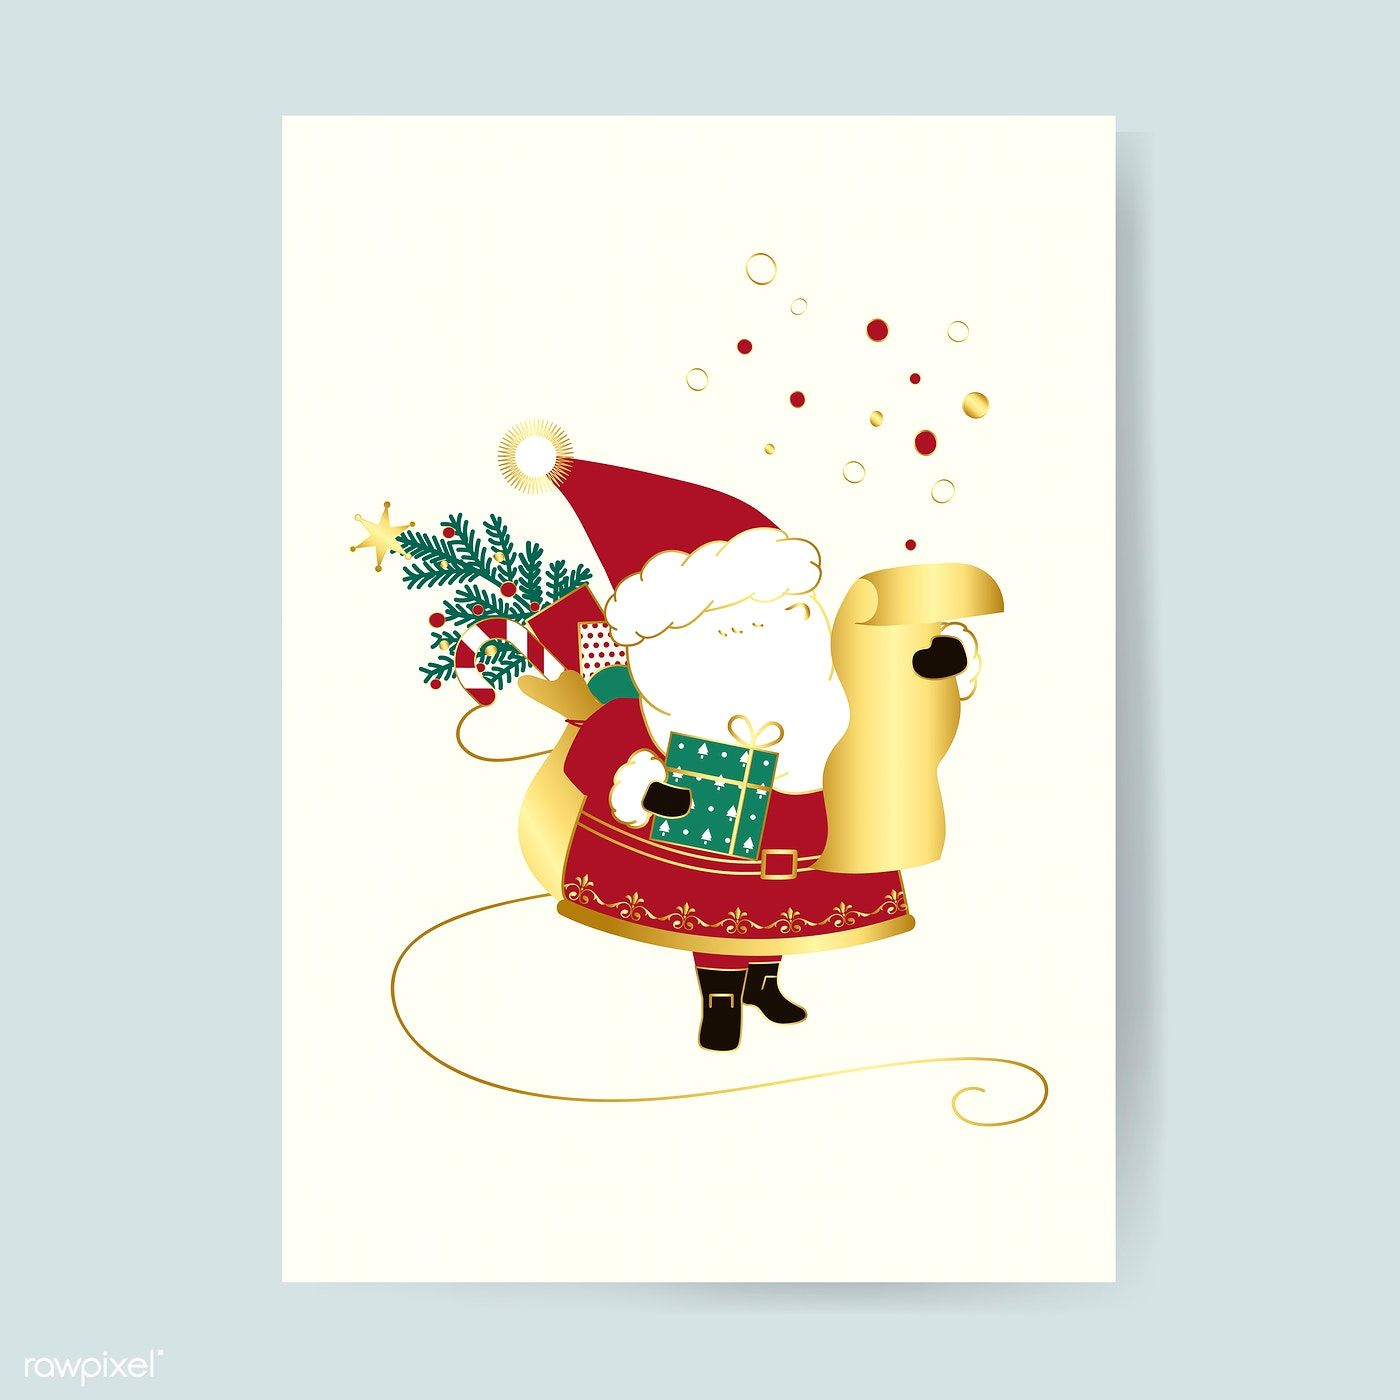 Santa Claus Christmas Card Vector Free Image By Rawpixel Com